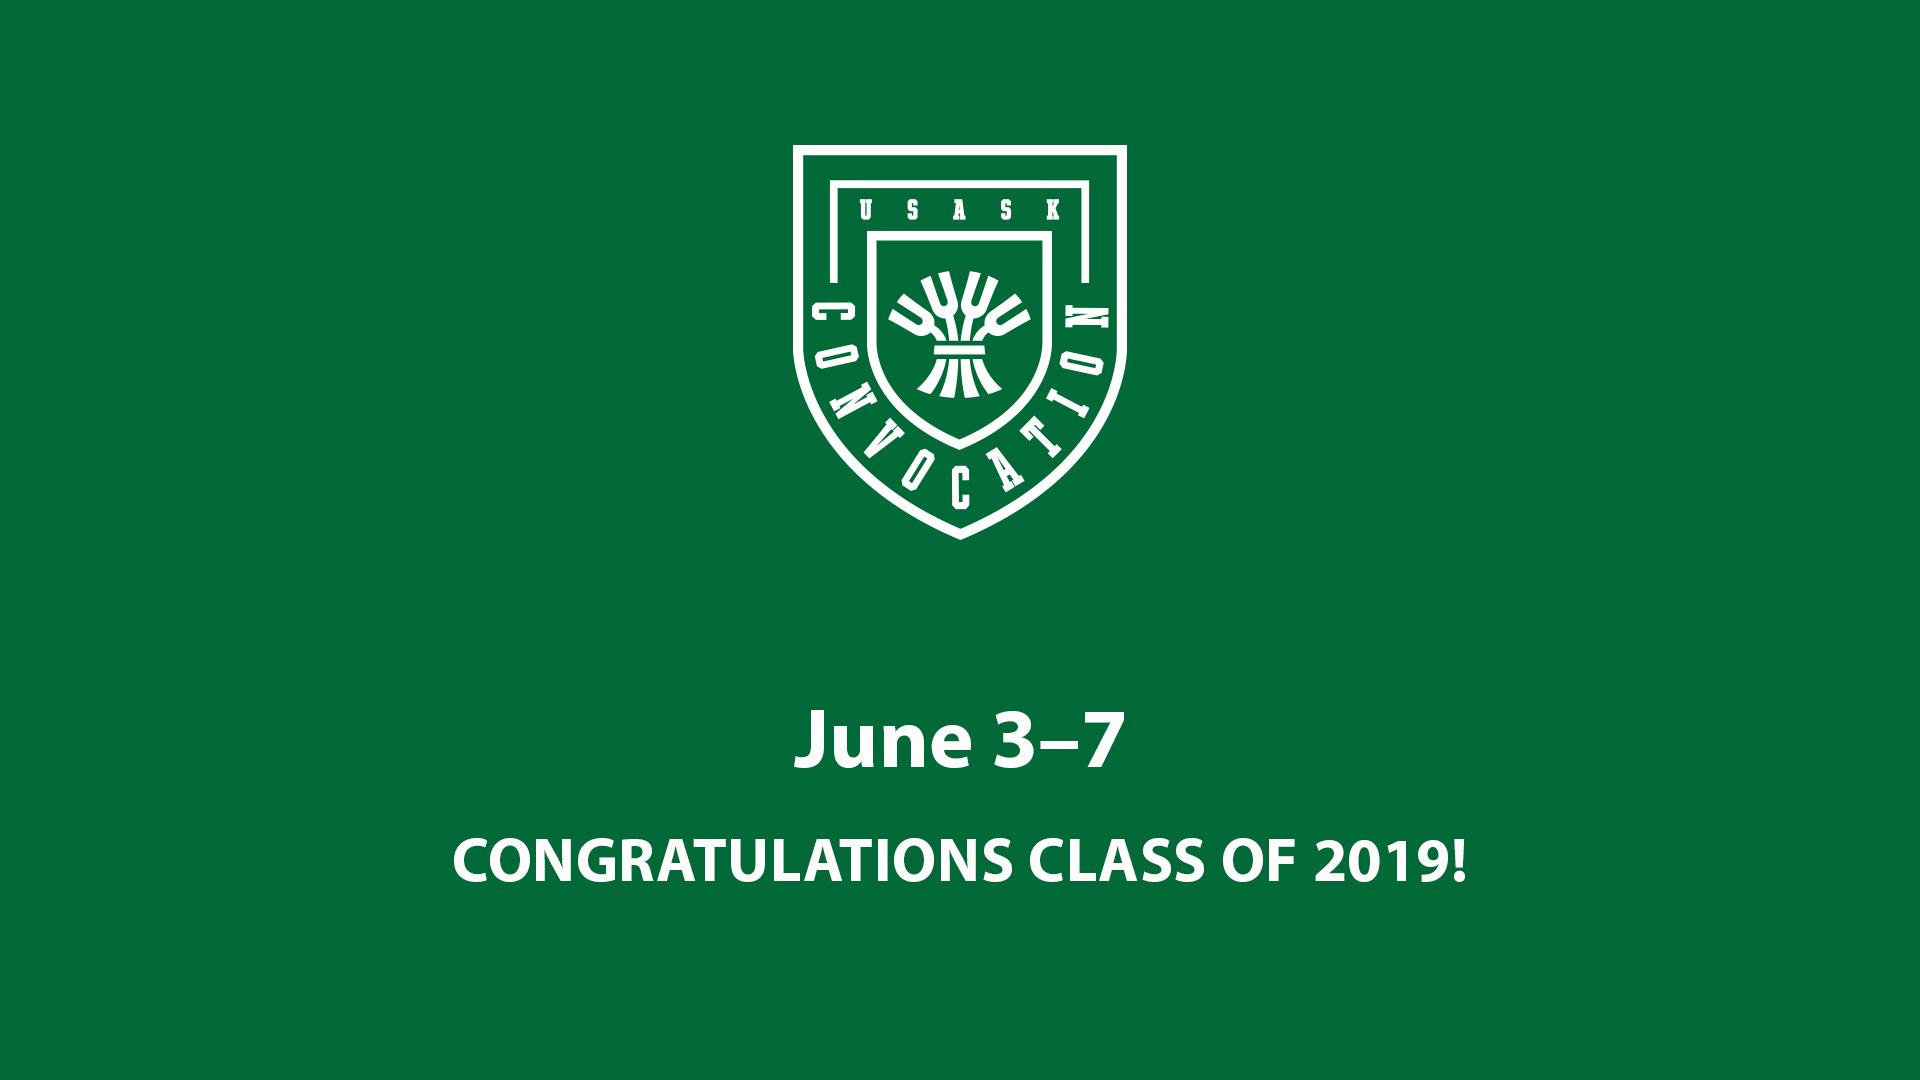 Graduation and Convocation - Students - University of Saskatchewan